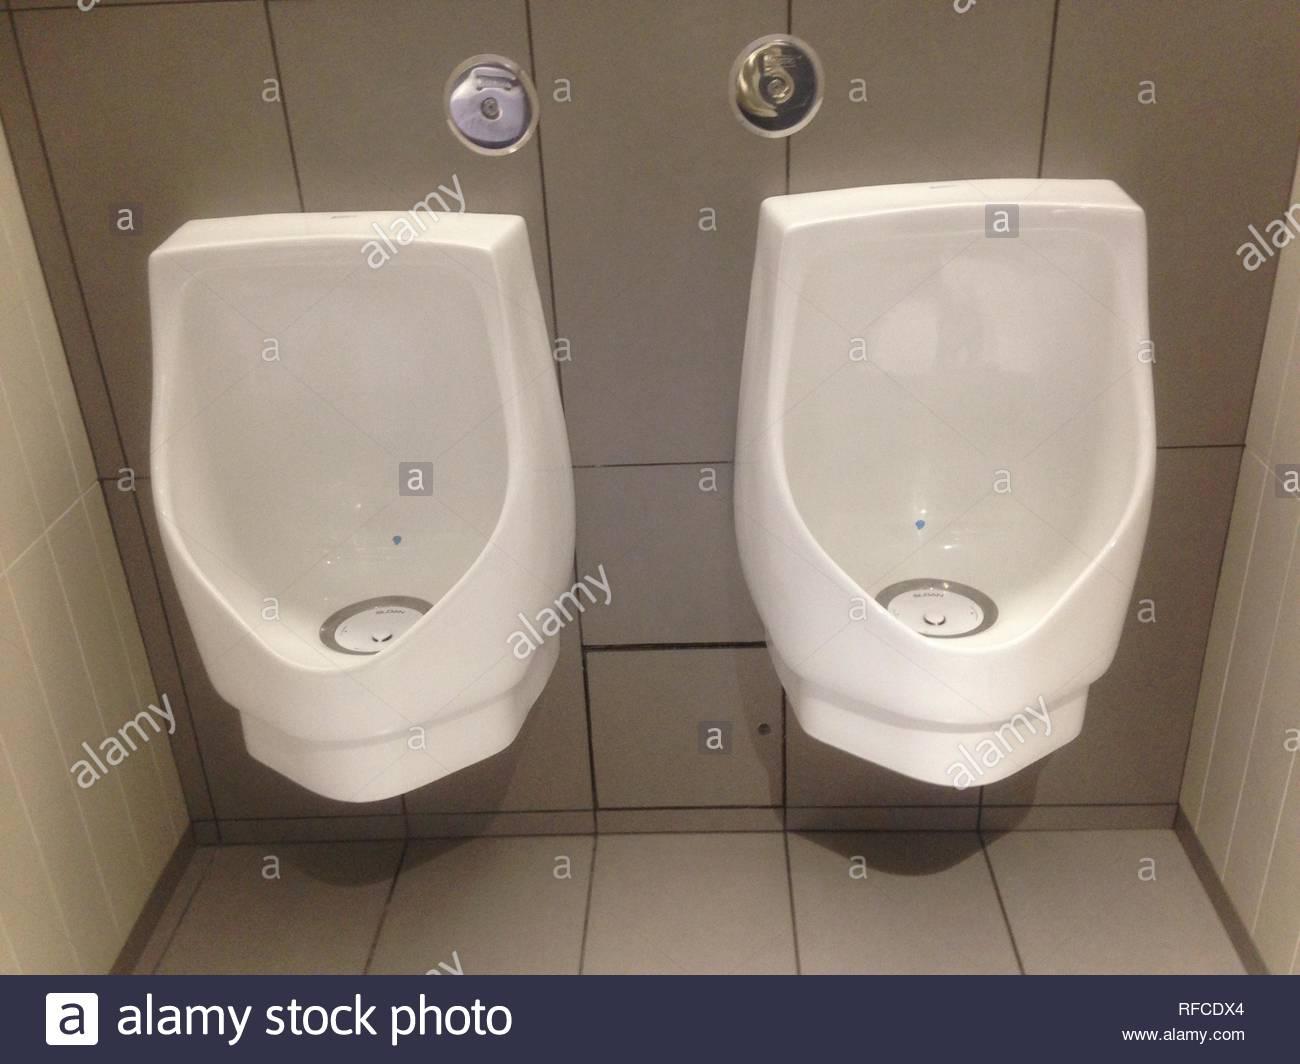 Urinals in Toronto, Ontario, Canada. - Stock Image